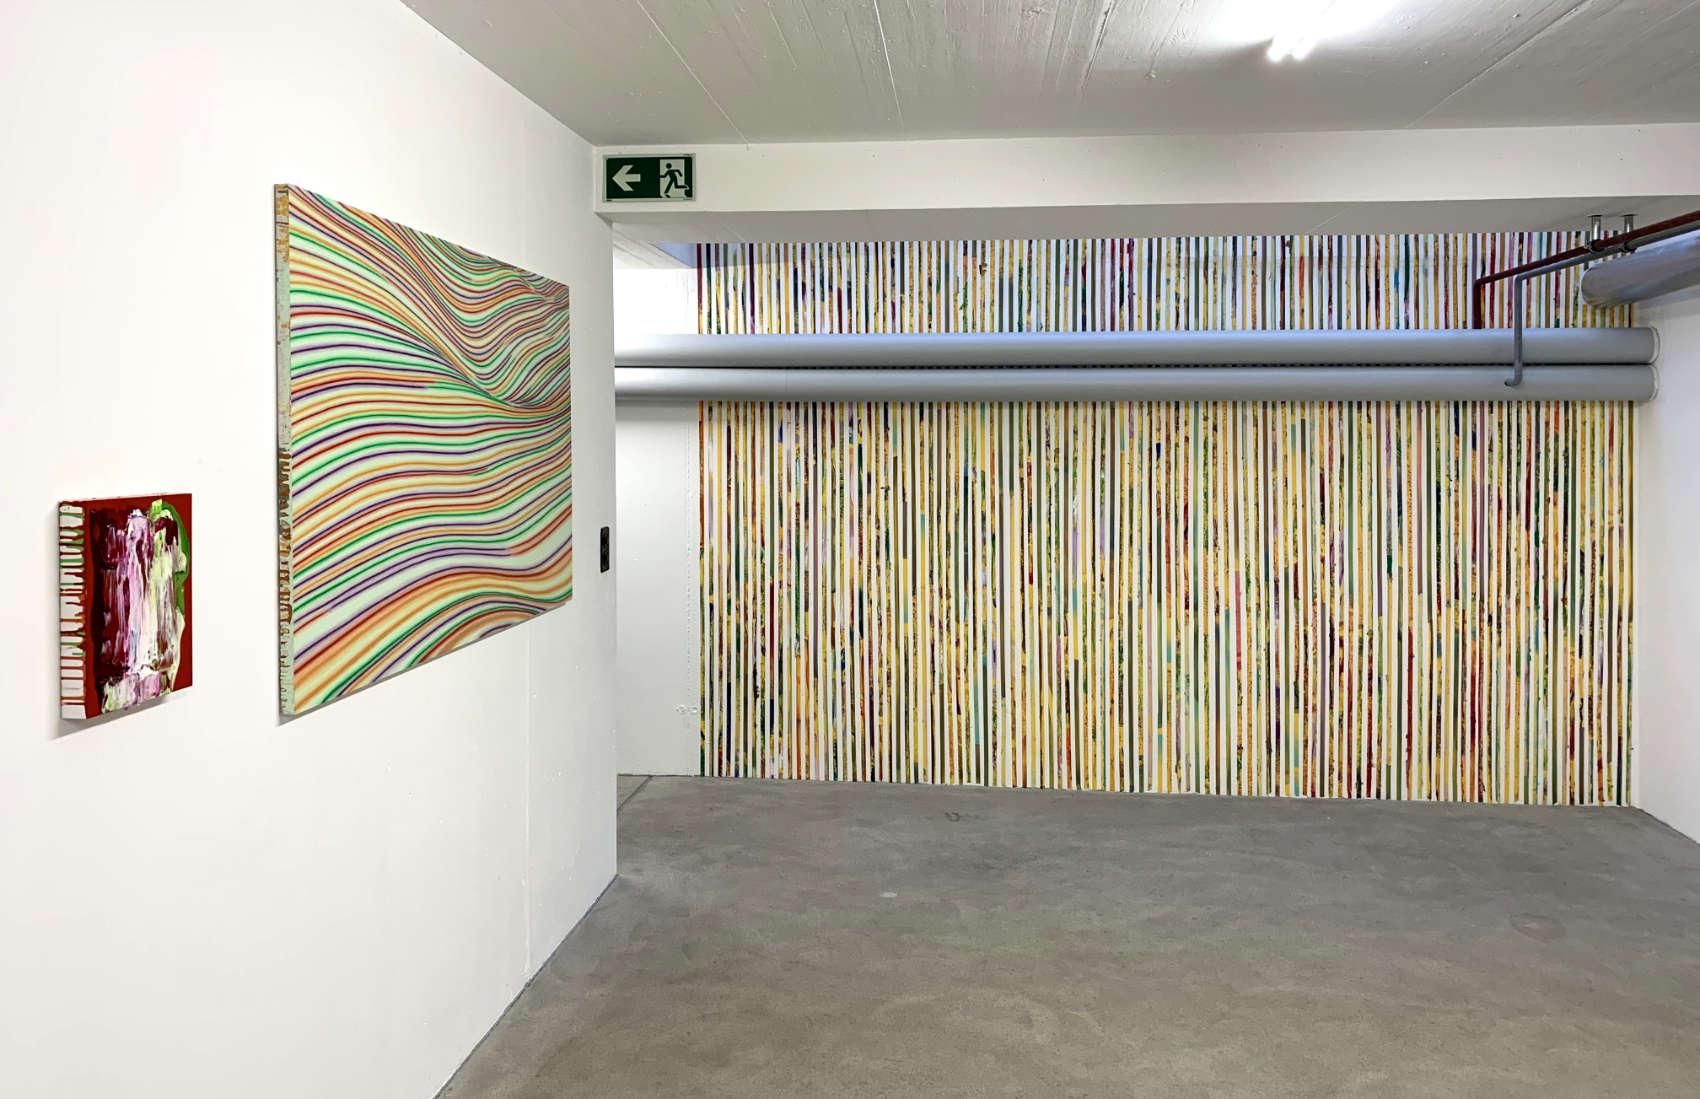 Installation, 2019, Club d'Art Contemporain, Lausanne